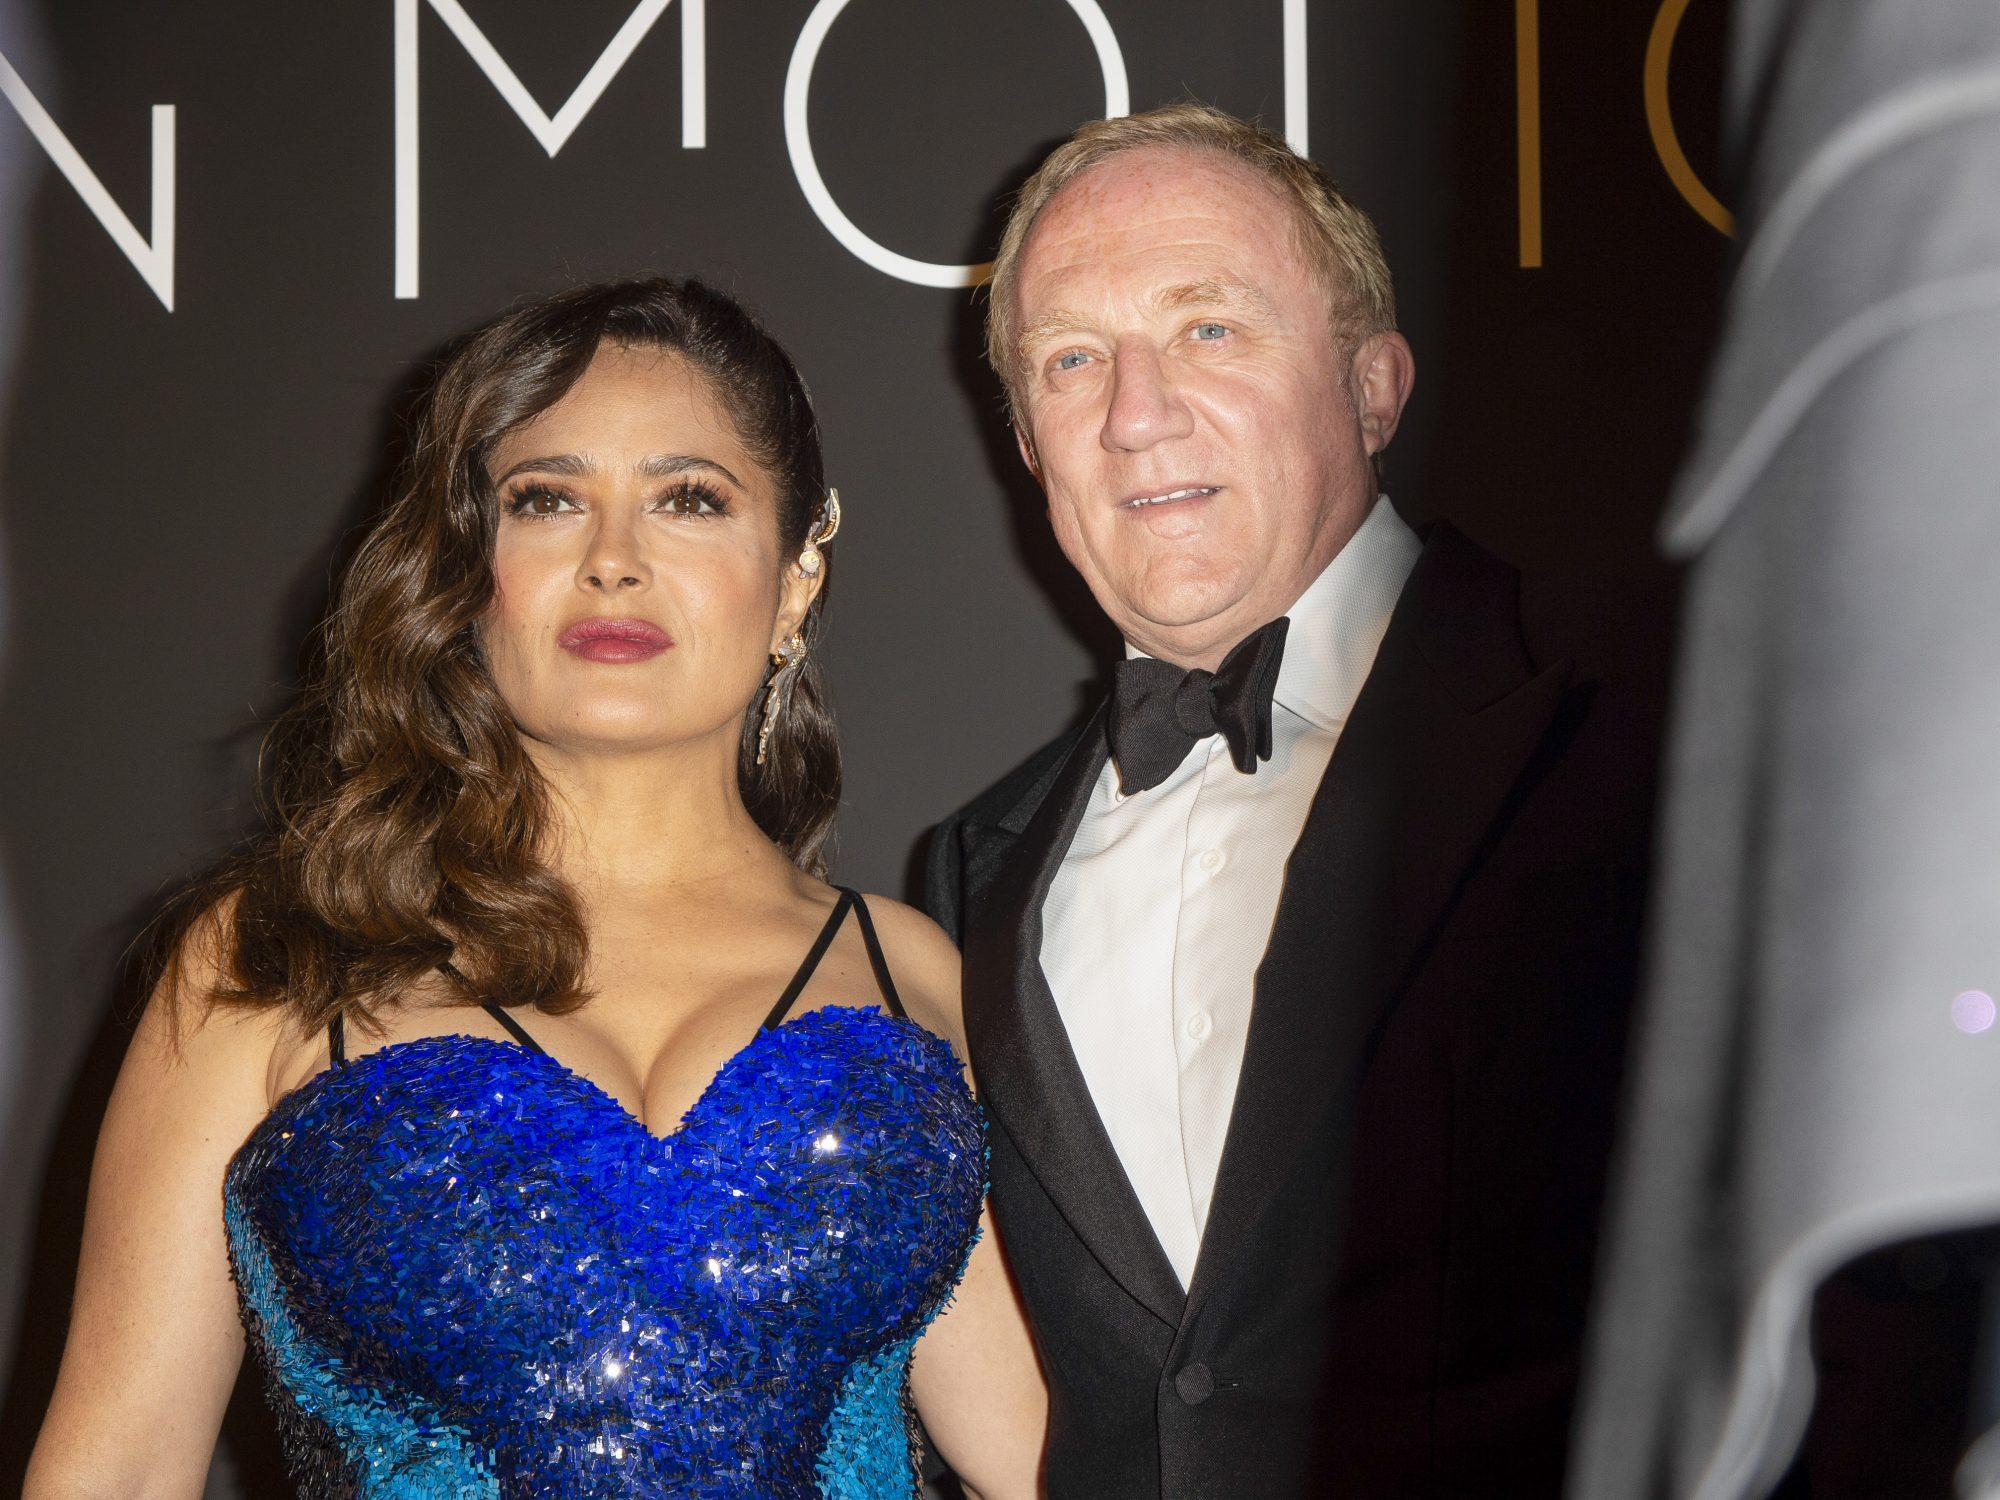 Salma Hayek in Blue Sequin Dress Attends the Kering Women Motion Awards in Cannes